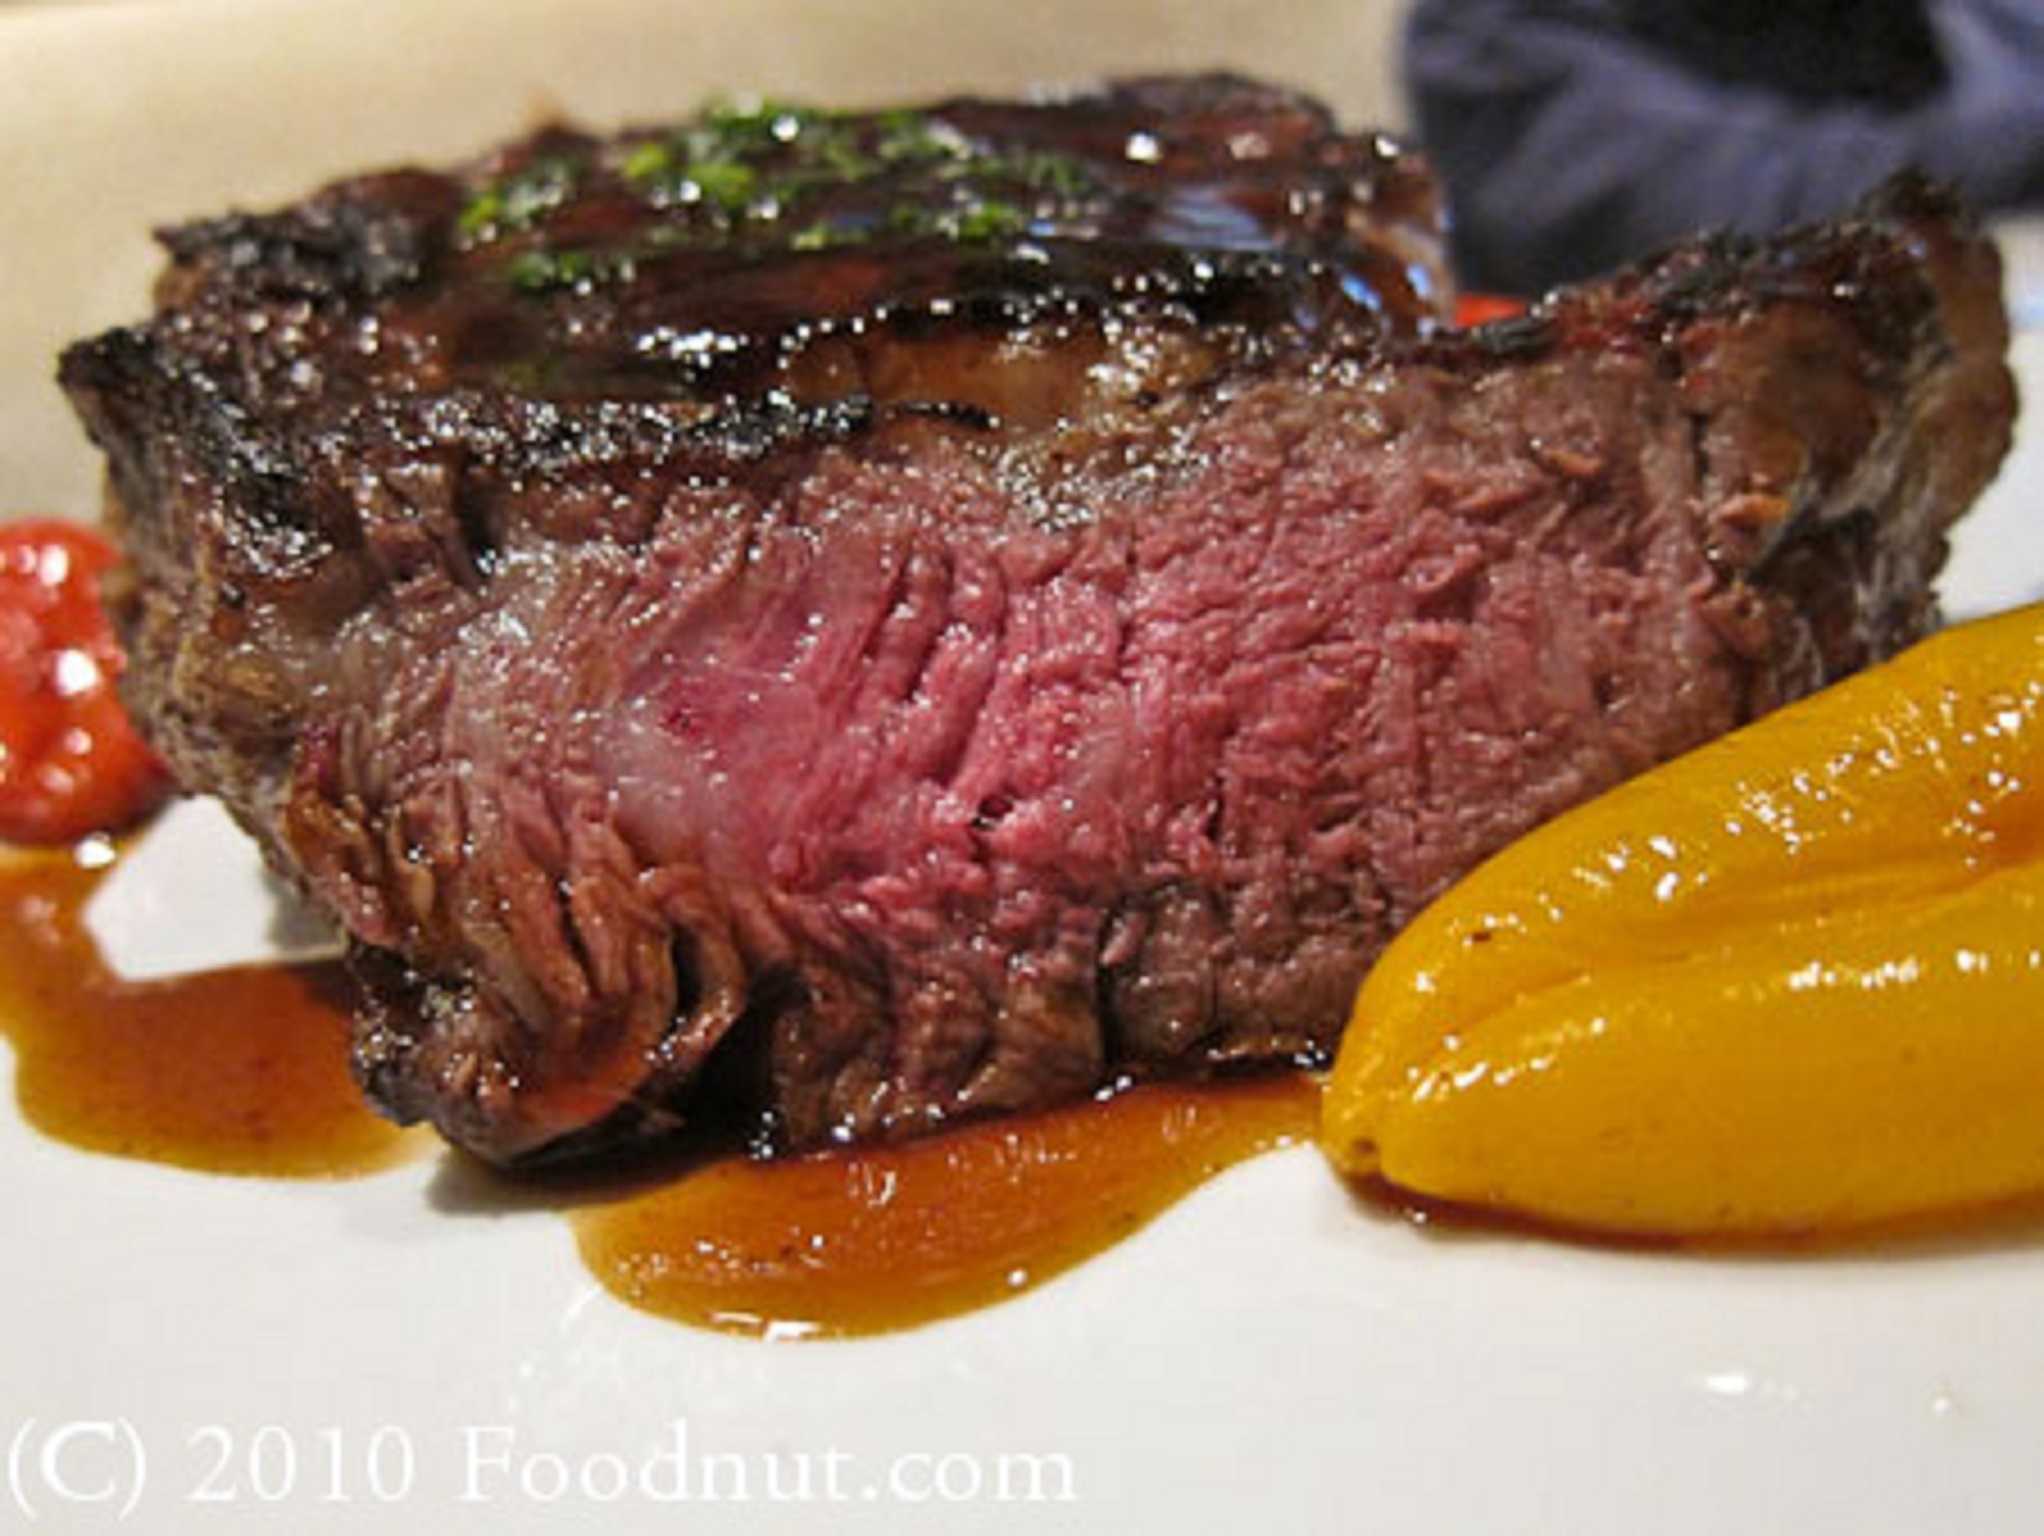 A steak next to a roasted pepper